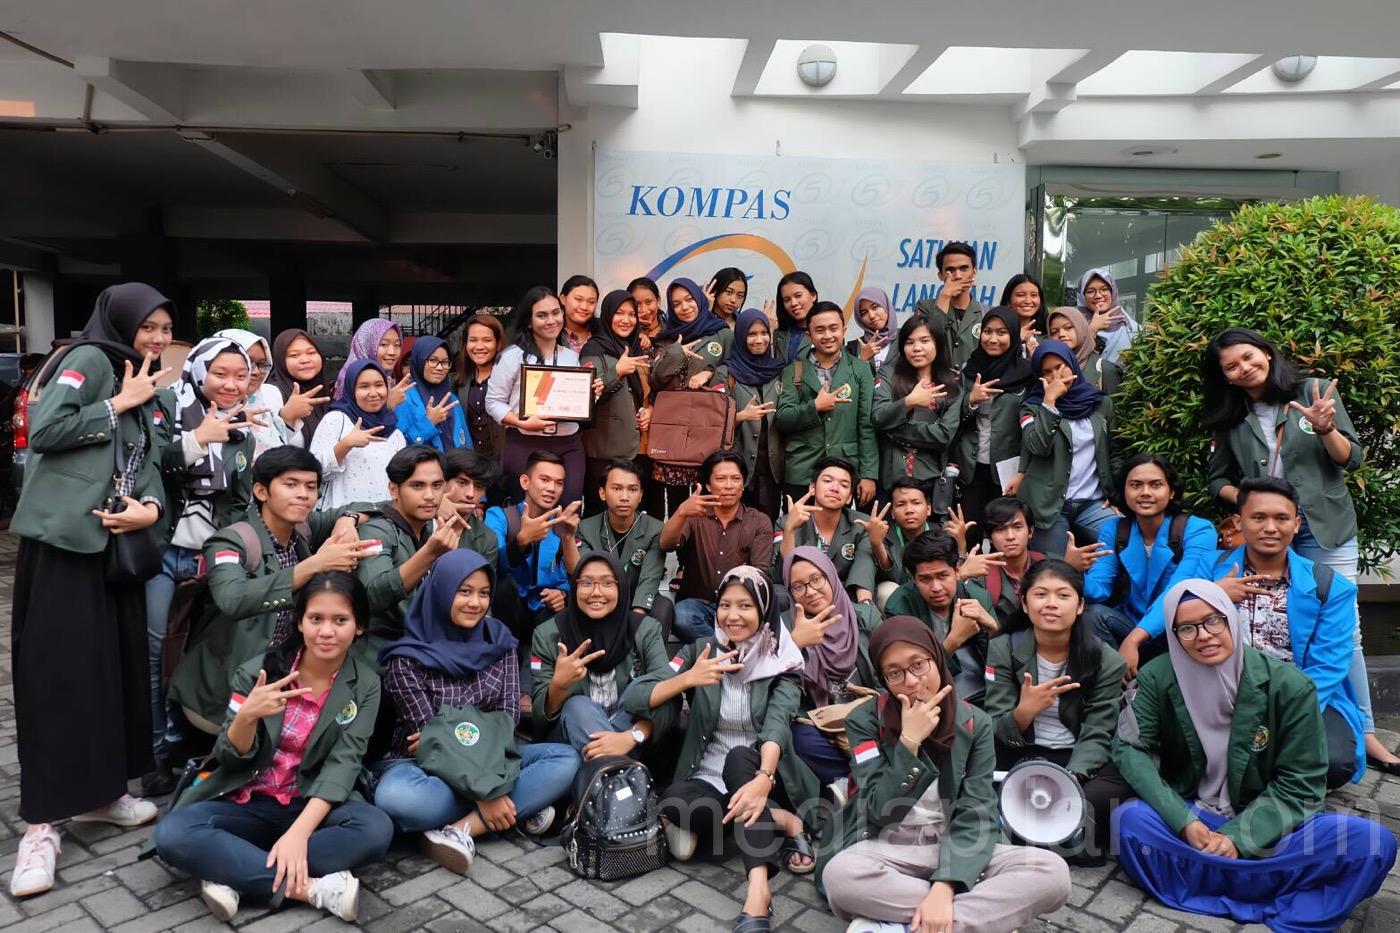 Suasana kunjungan Media ke Kompas TV di Hari kedua pada acara Pelatihan Jurnalistik Tingkat Dasar (29/3). (Fotografer: Putri Arum Marzura)